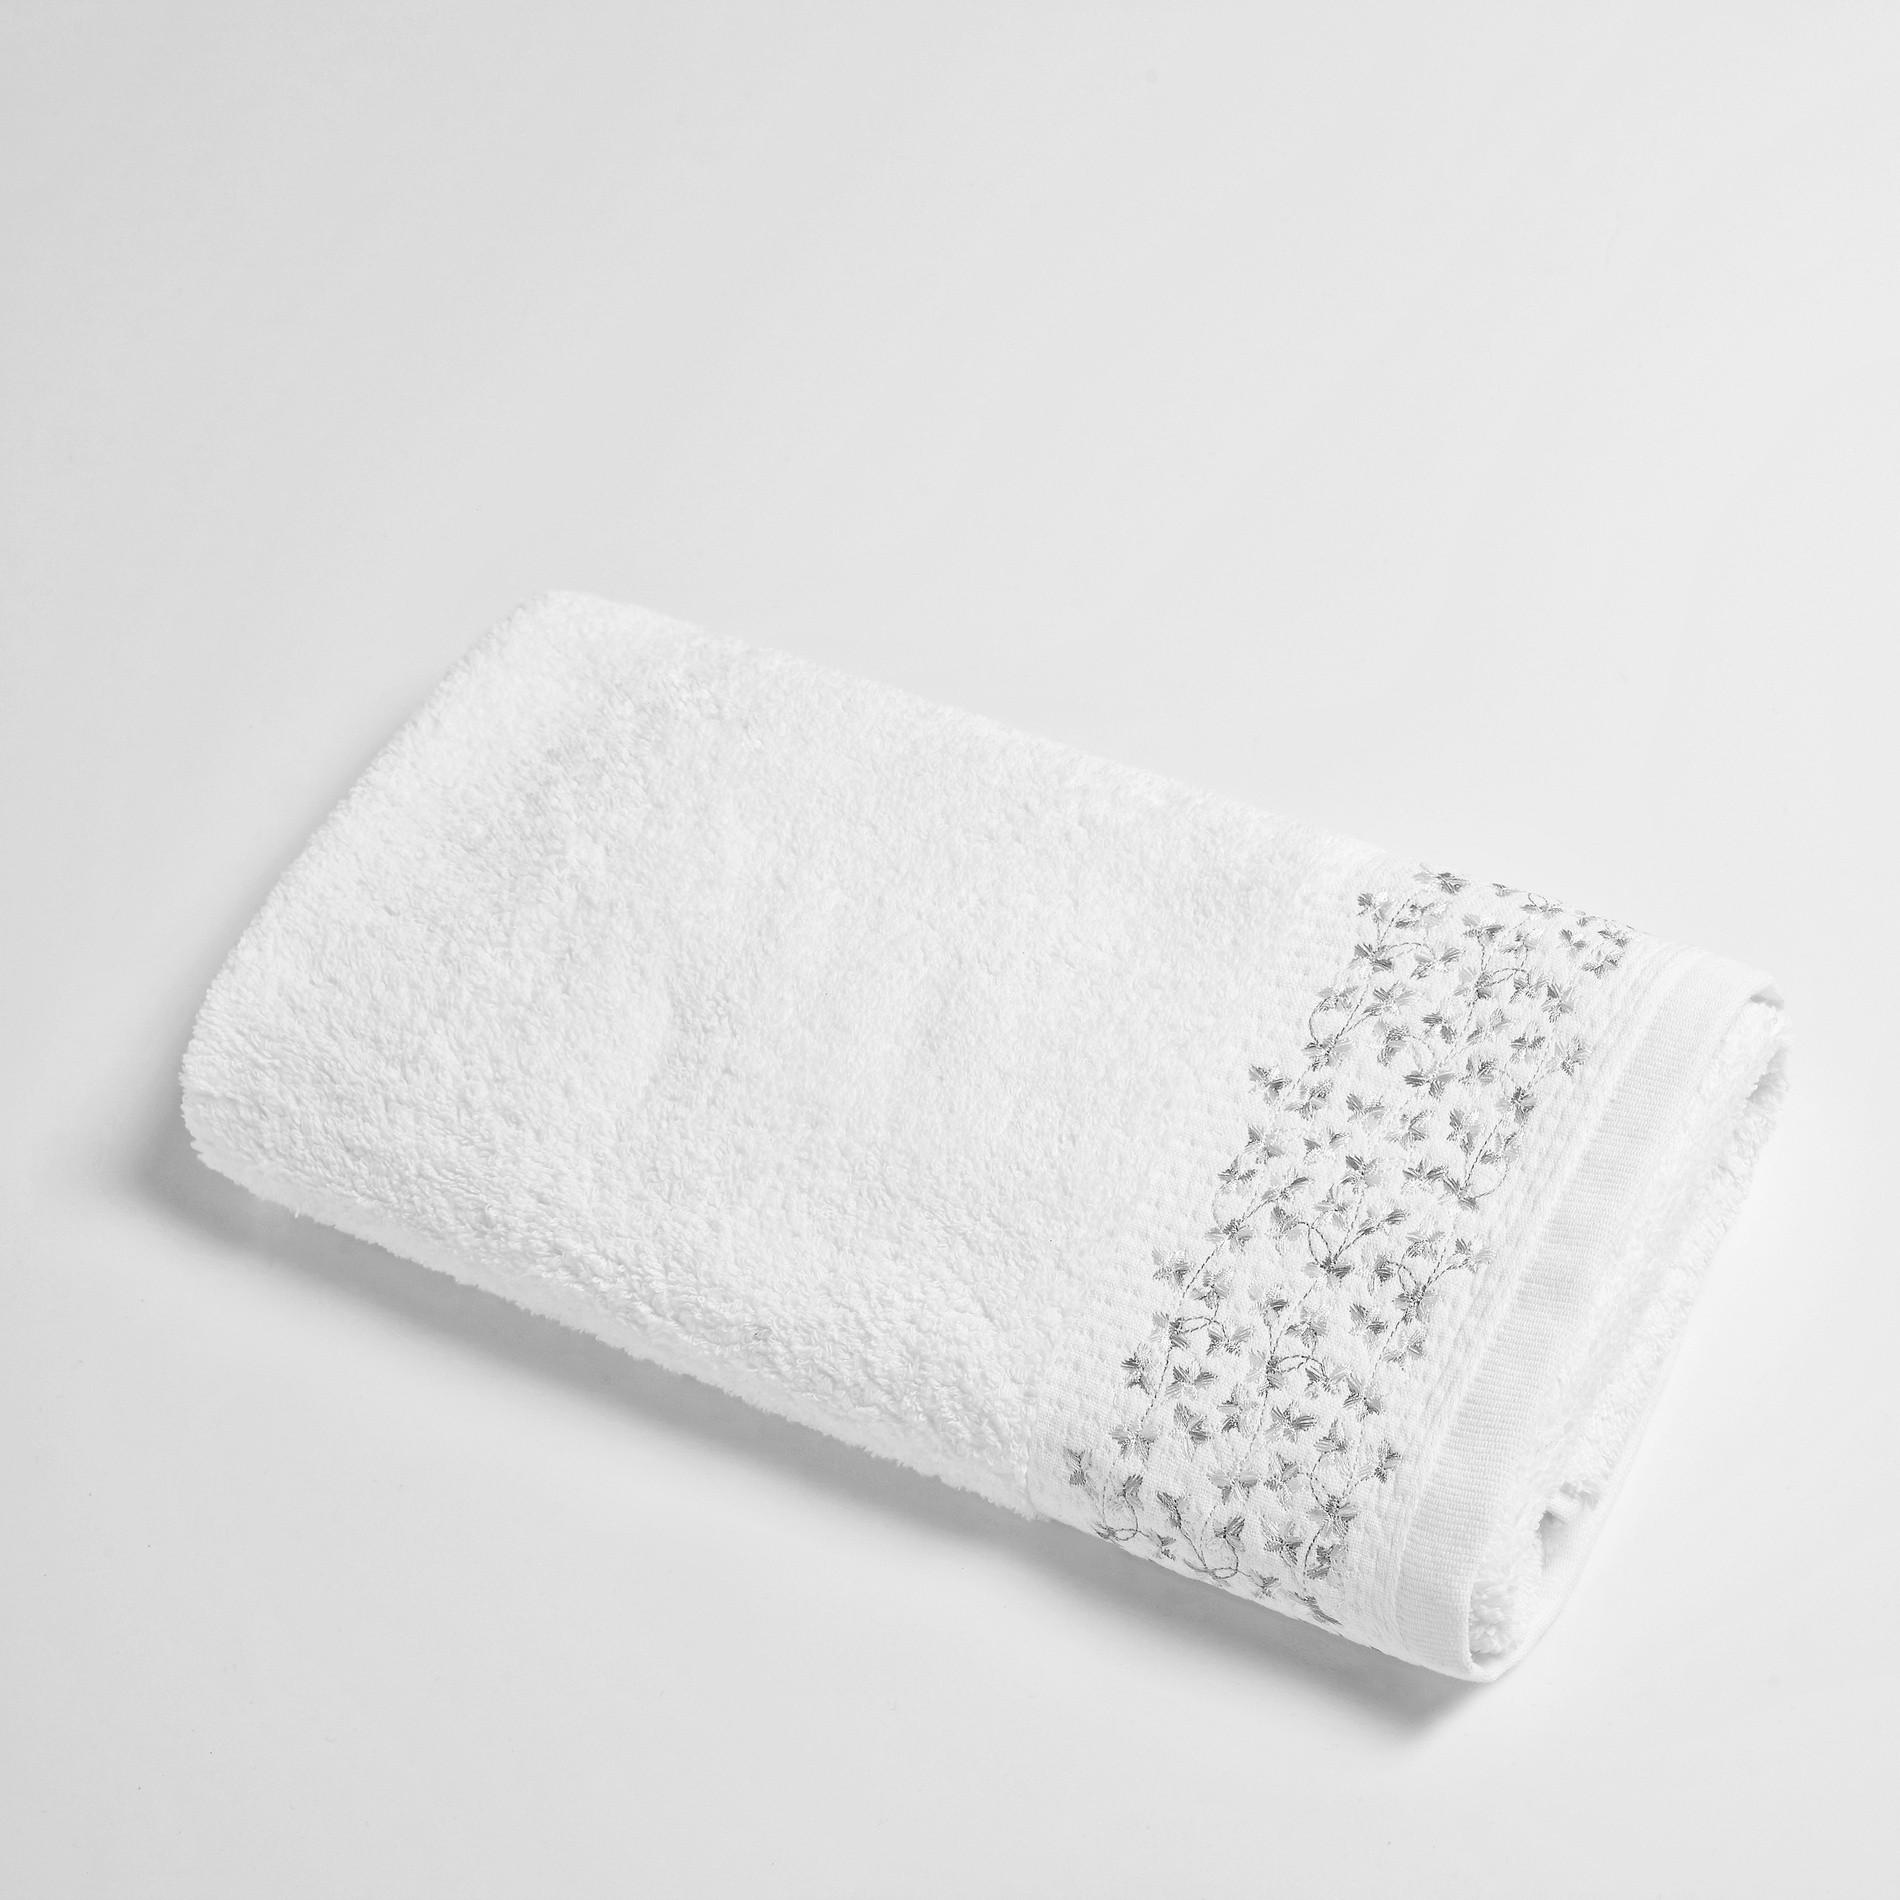 Asciugamano con balza ricamata Portofino, Bianco, large image number 1